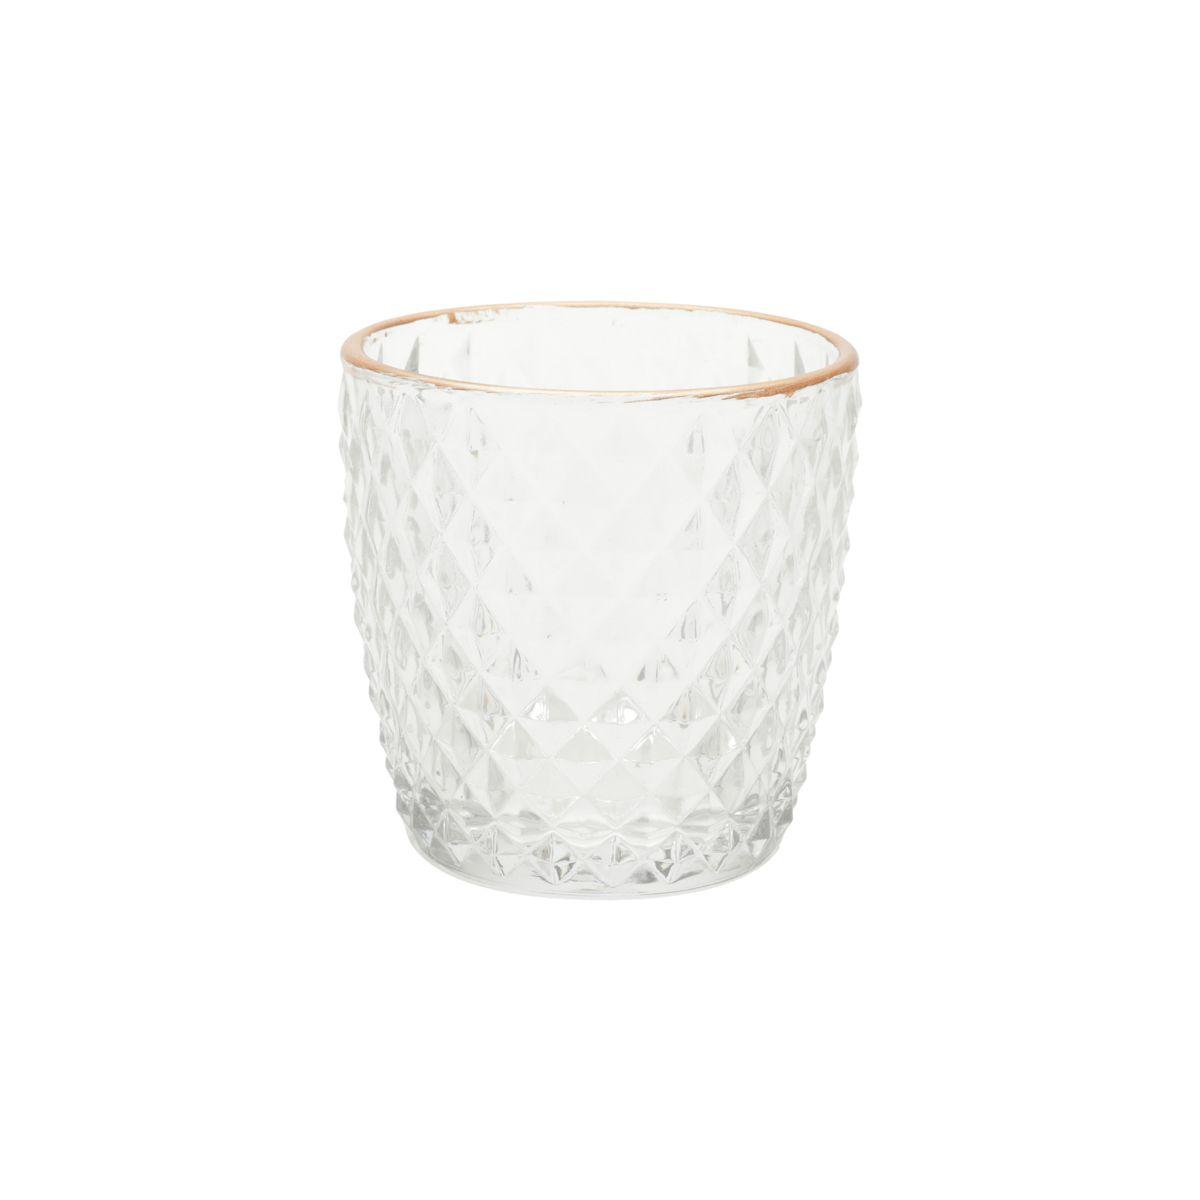 Castiçal de Vidro Colar Diamonds  7,2 cm x 7,2 cm x 7,5 cm